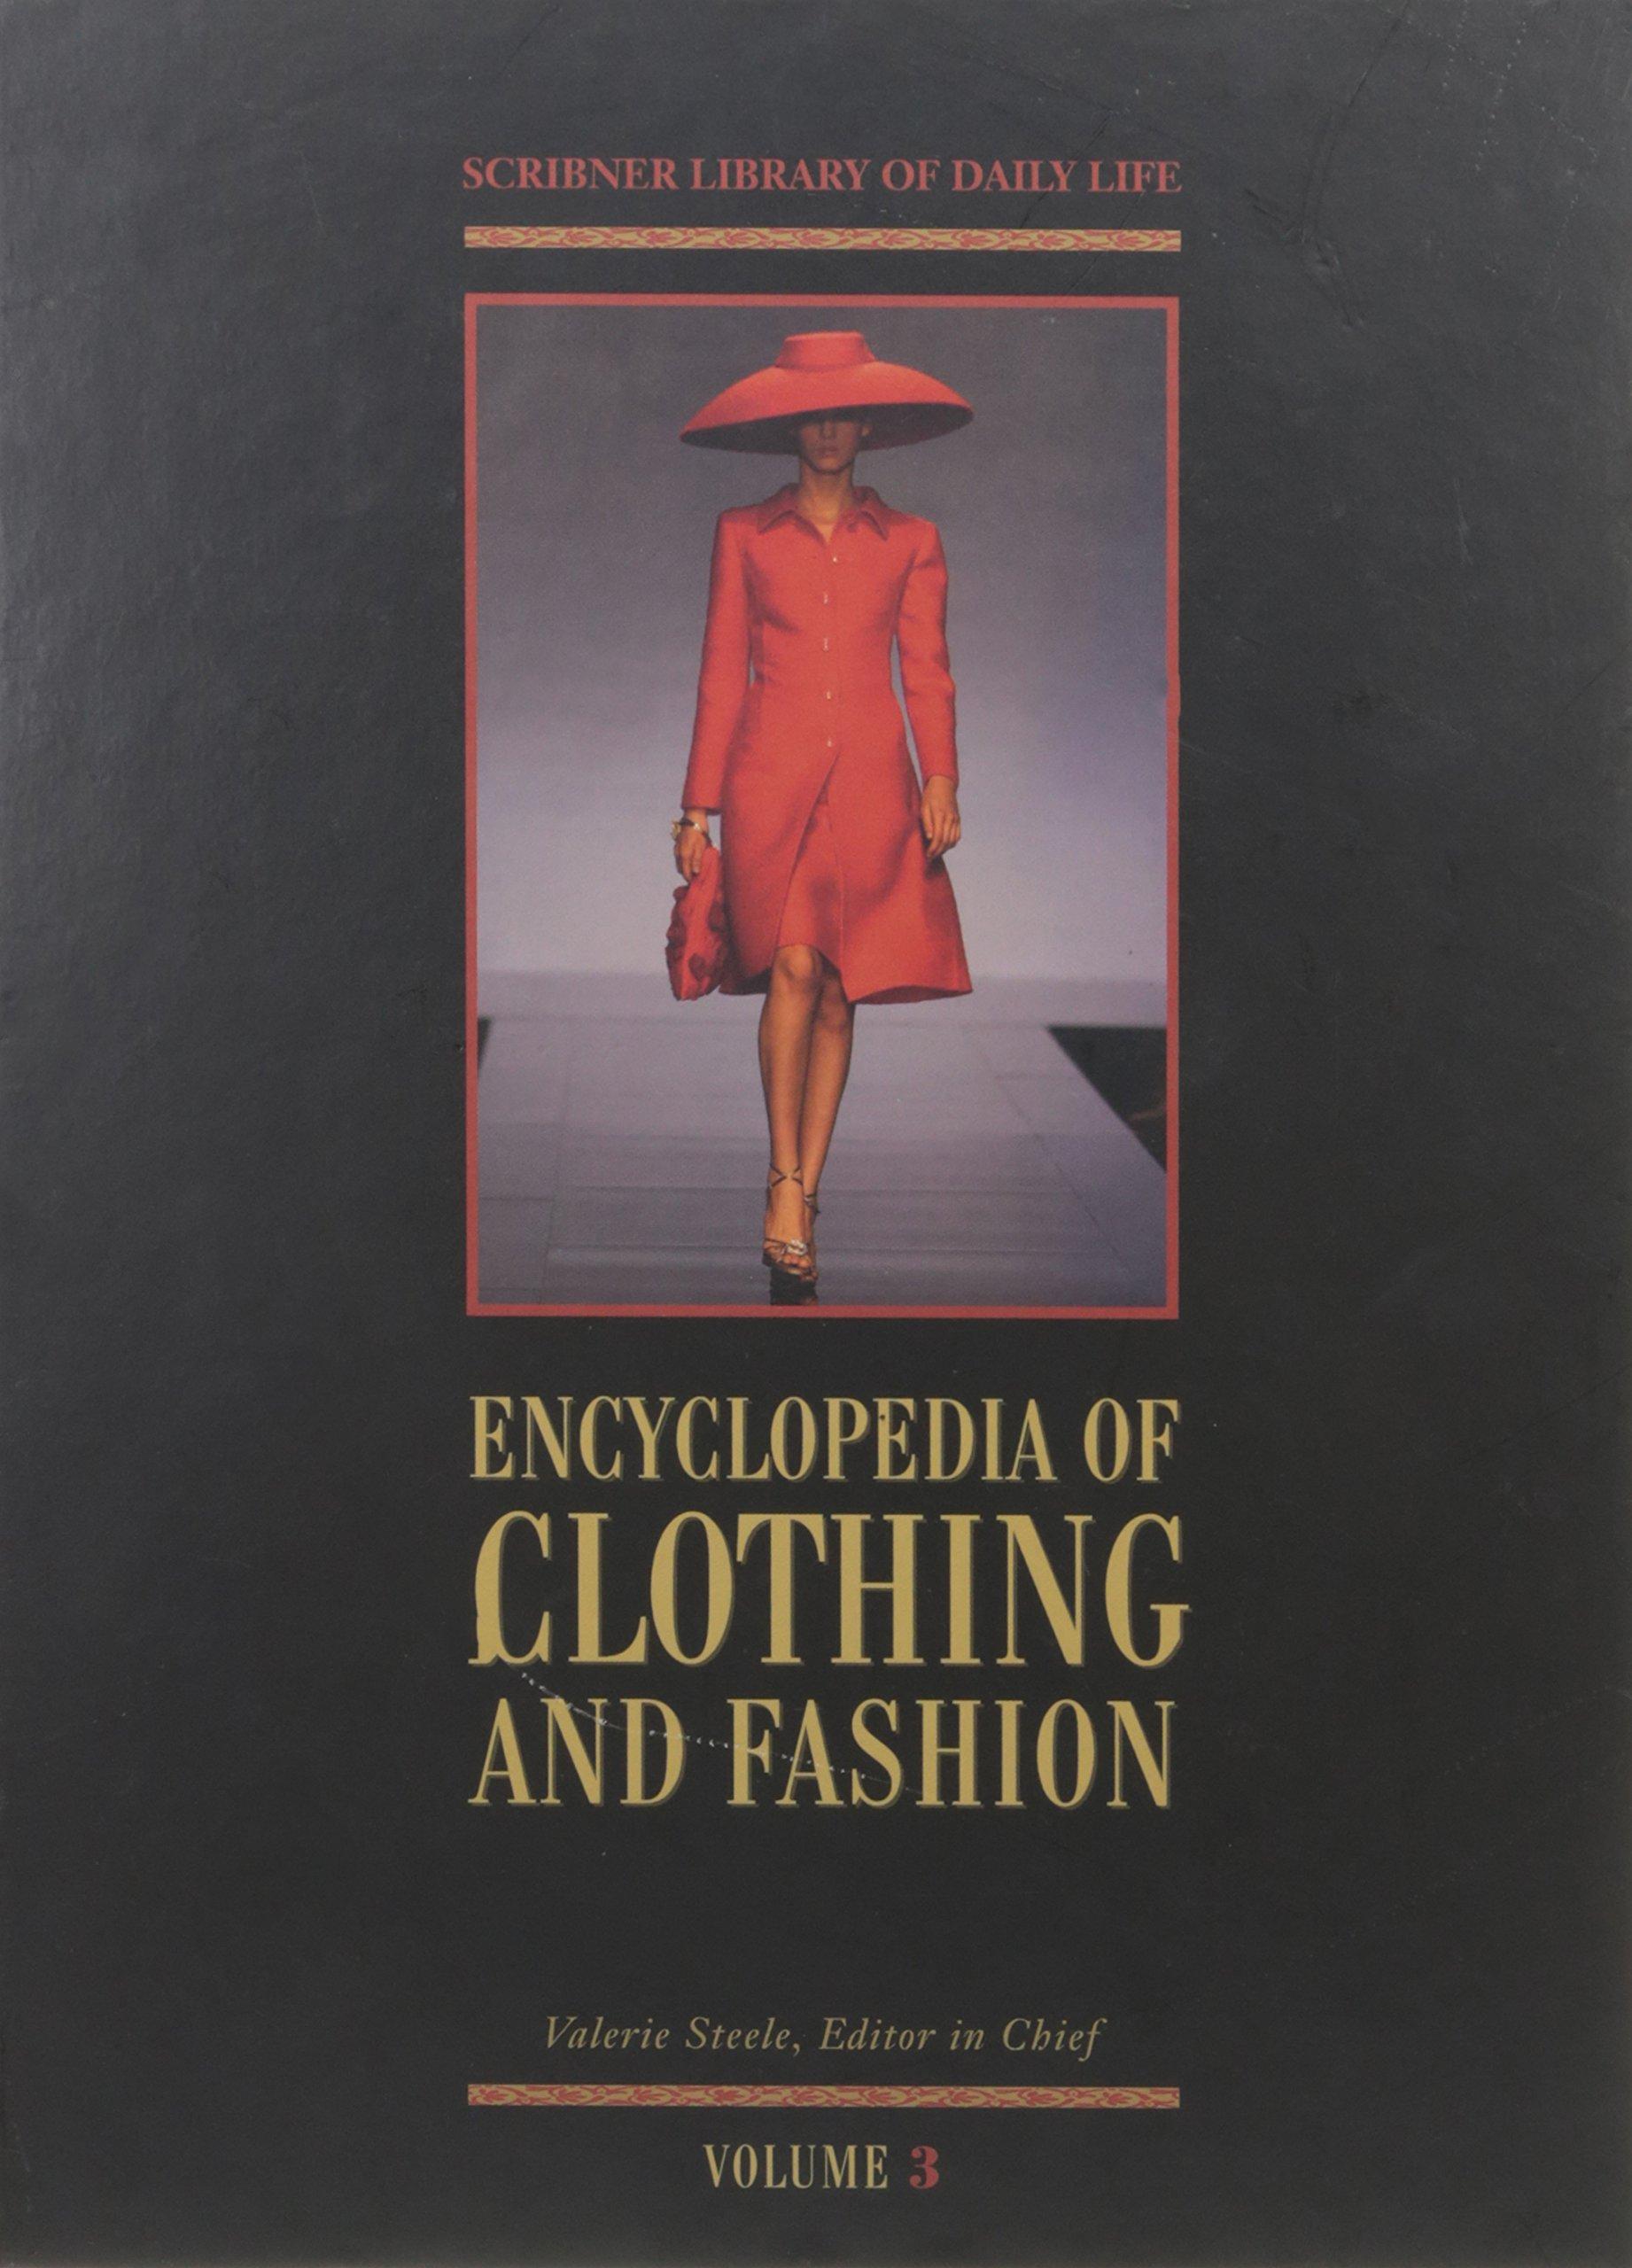 40550ab005 Encyclopedia Of Clothing And Fashion: Valerie Steele: 9780684313979 ...